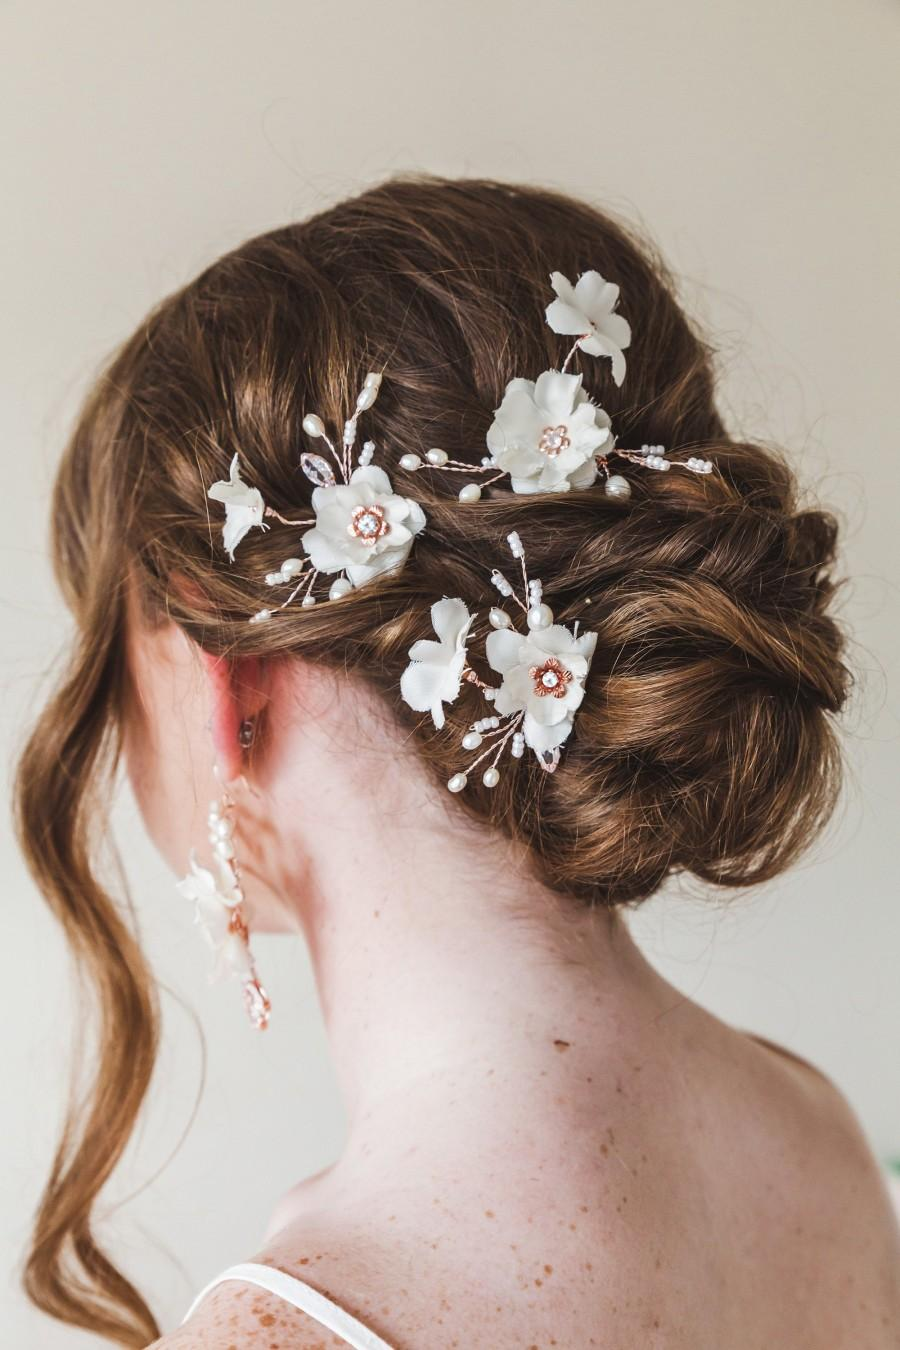 Wedding - Off white silk flower bridal hair pins Cream blossom flower wedding hair pins Rose gold crystal hair pins Set of 3 Bridesmaid gift hairpins